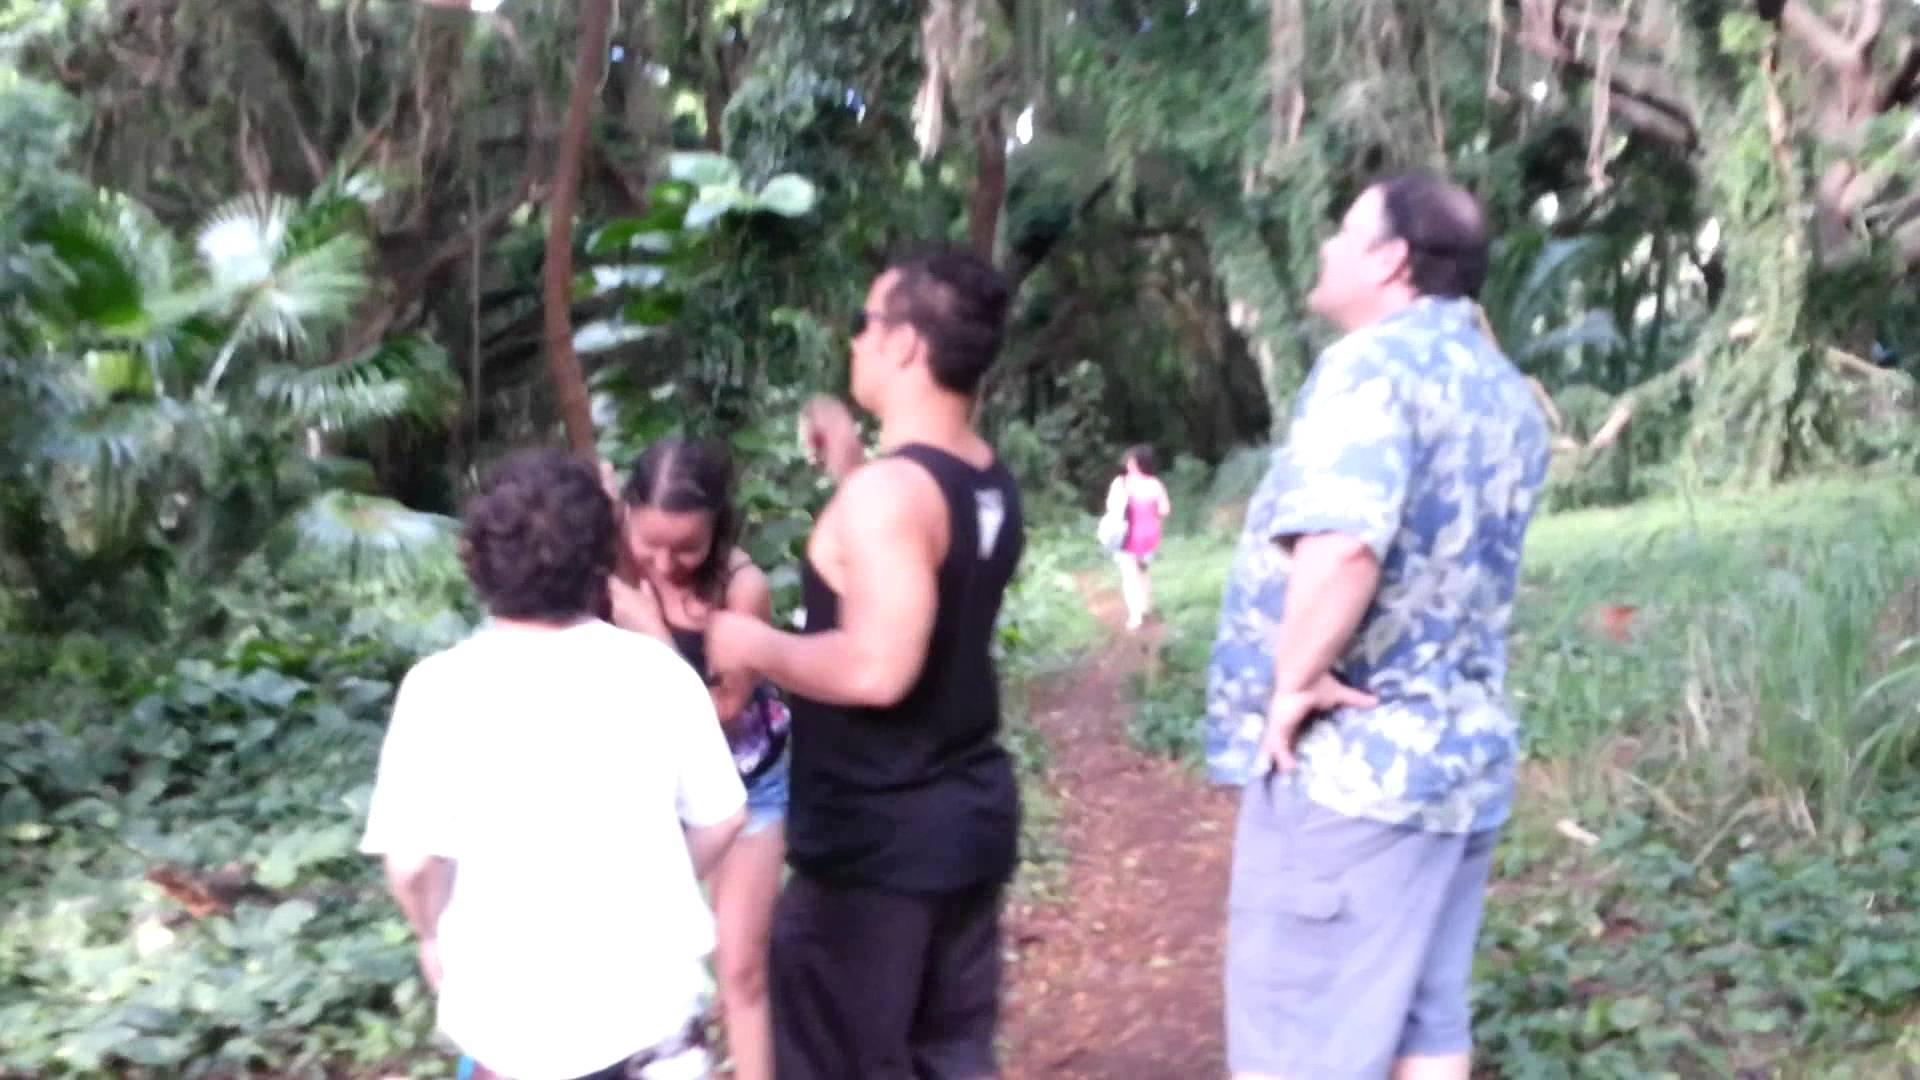 Lost in the Hawaiian Jungle *Galaxy S3 back camera*